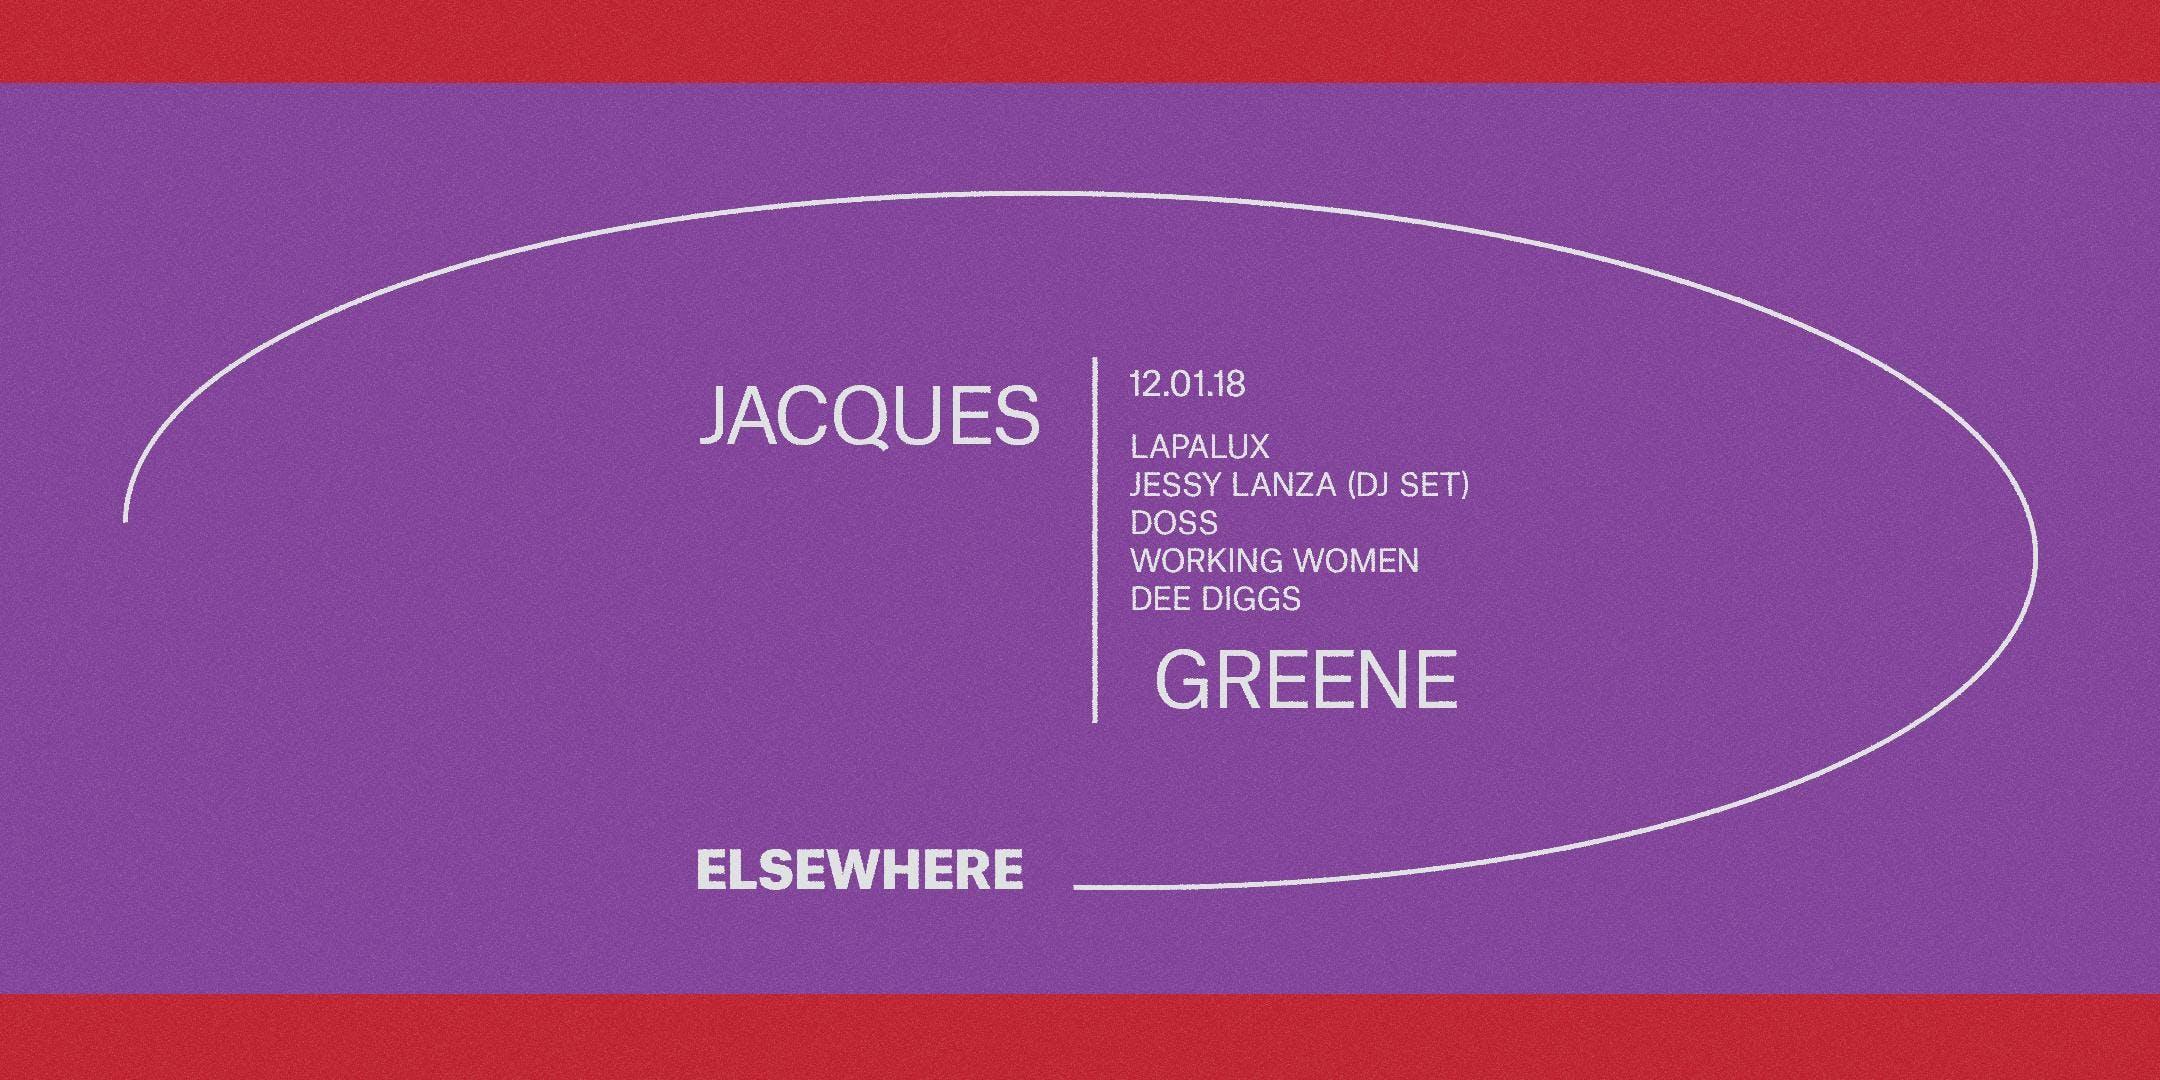 Jacques Greene, Lapalux, Working Women, Jessy Lanza (DJ Set), Doss & Dee Diggs